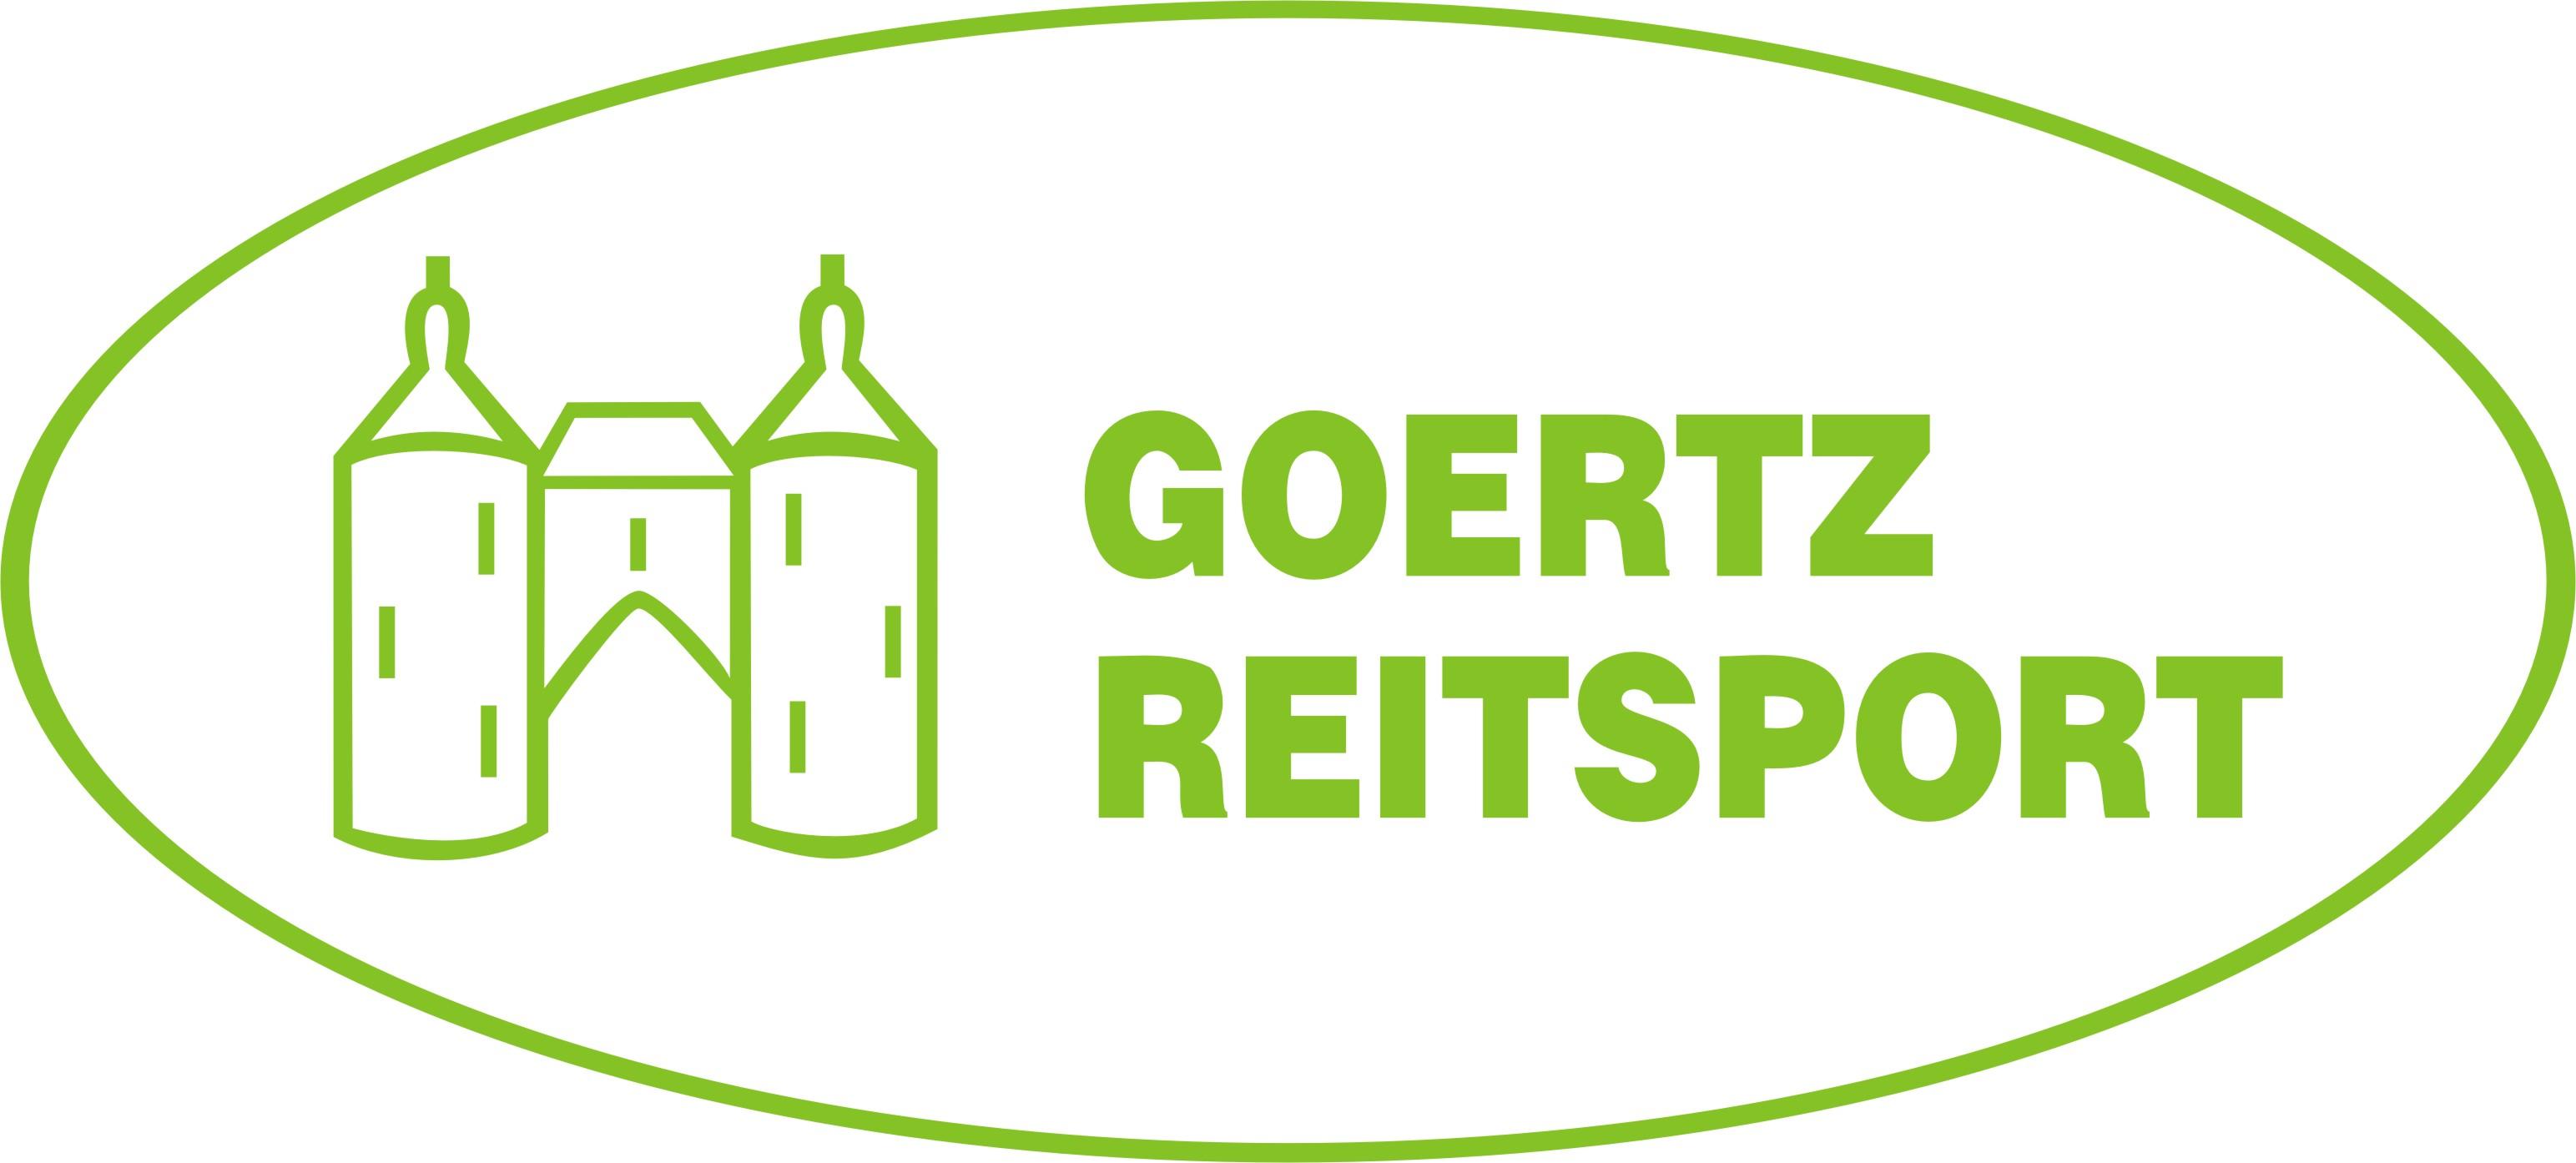 Goertz